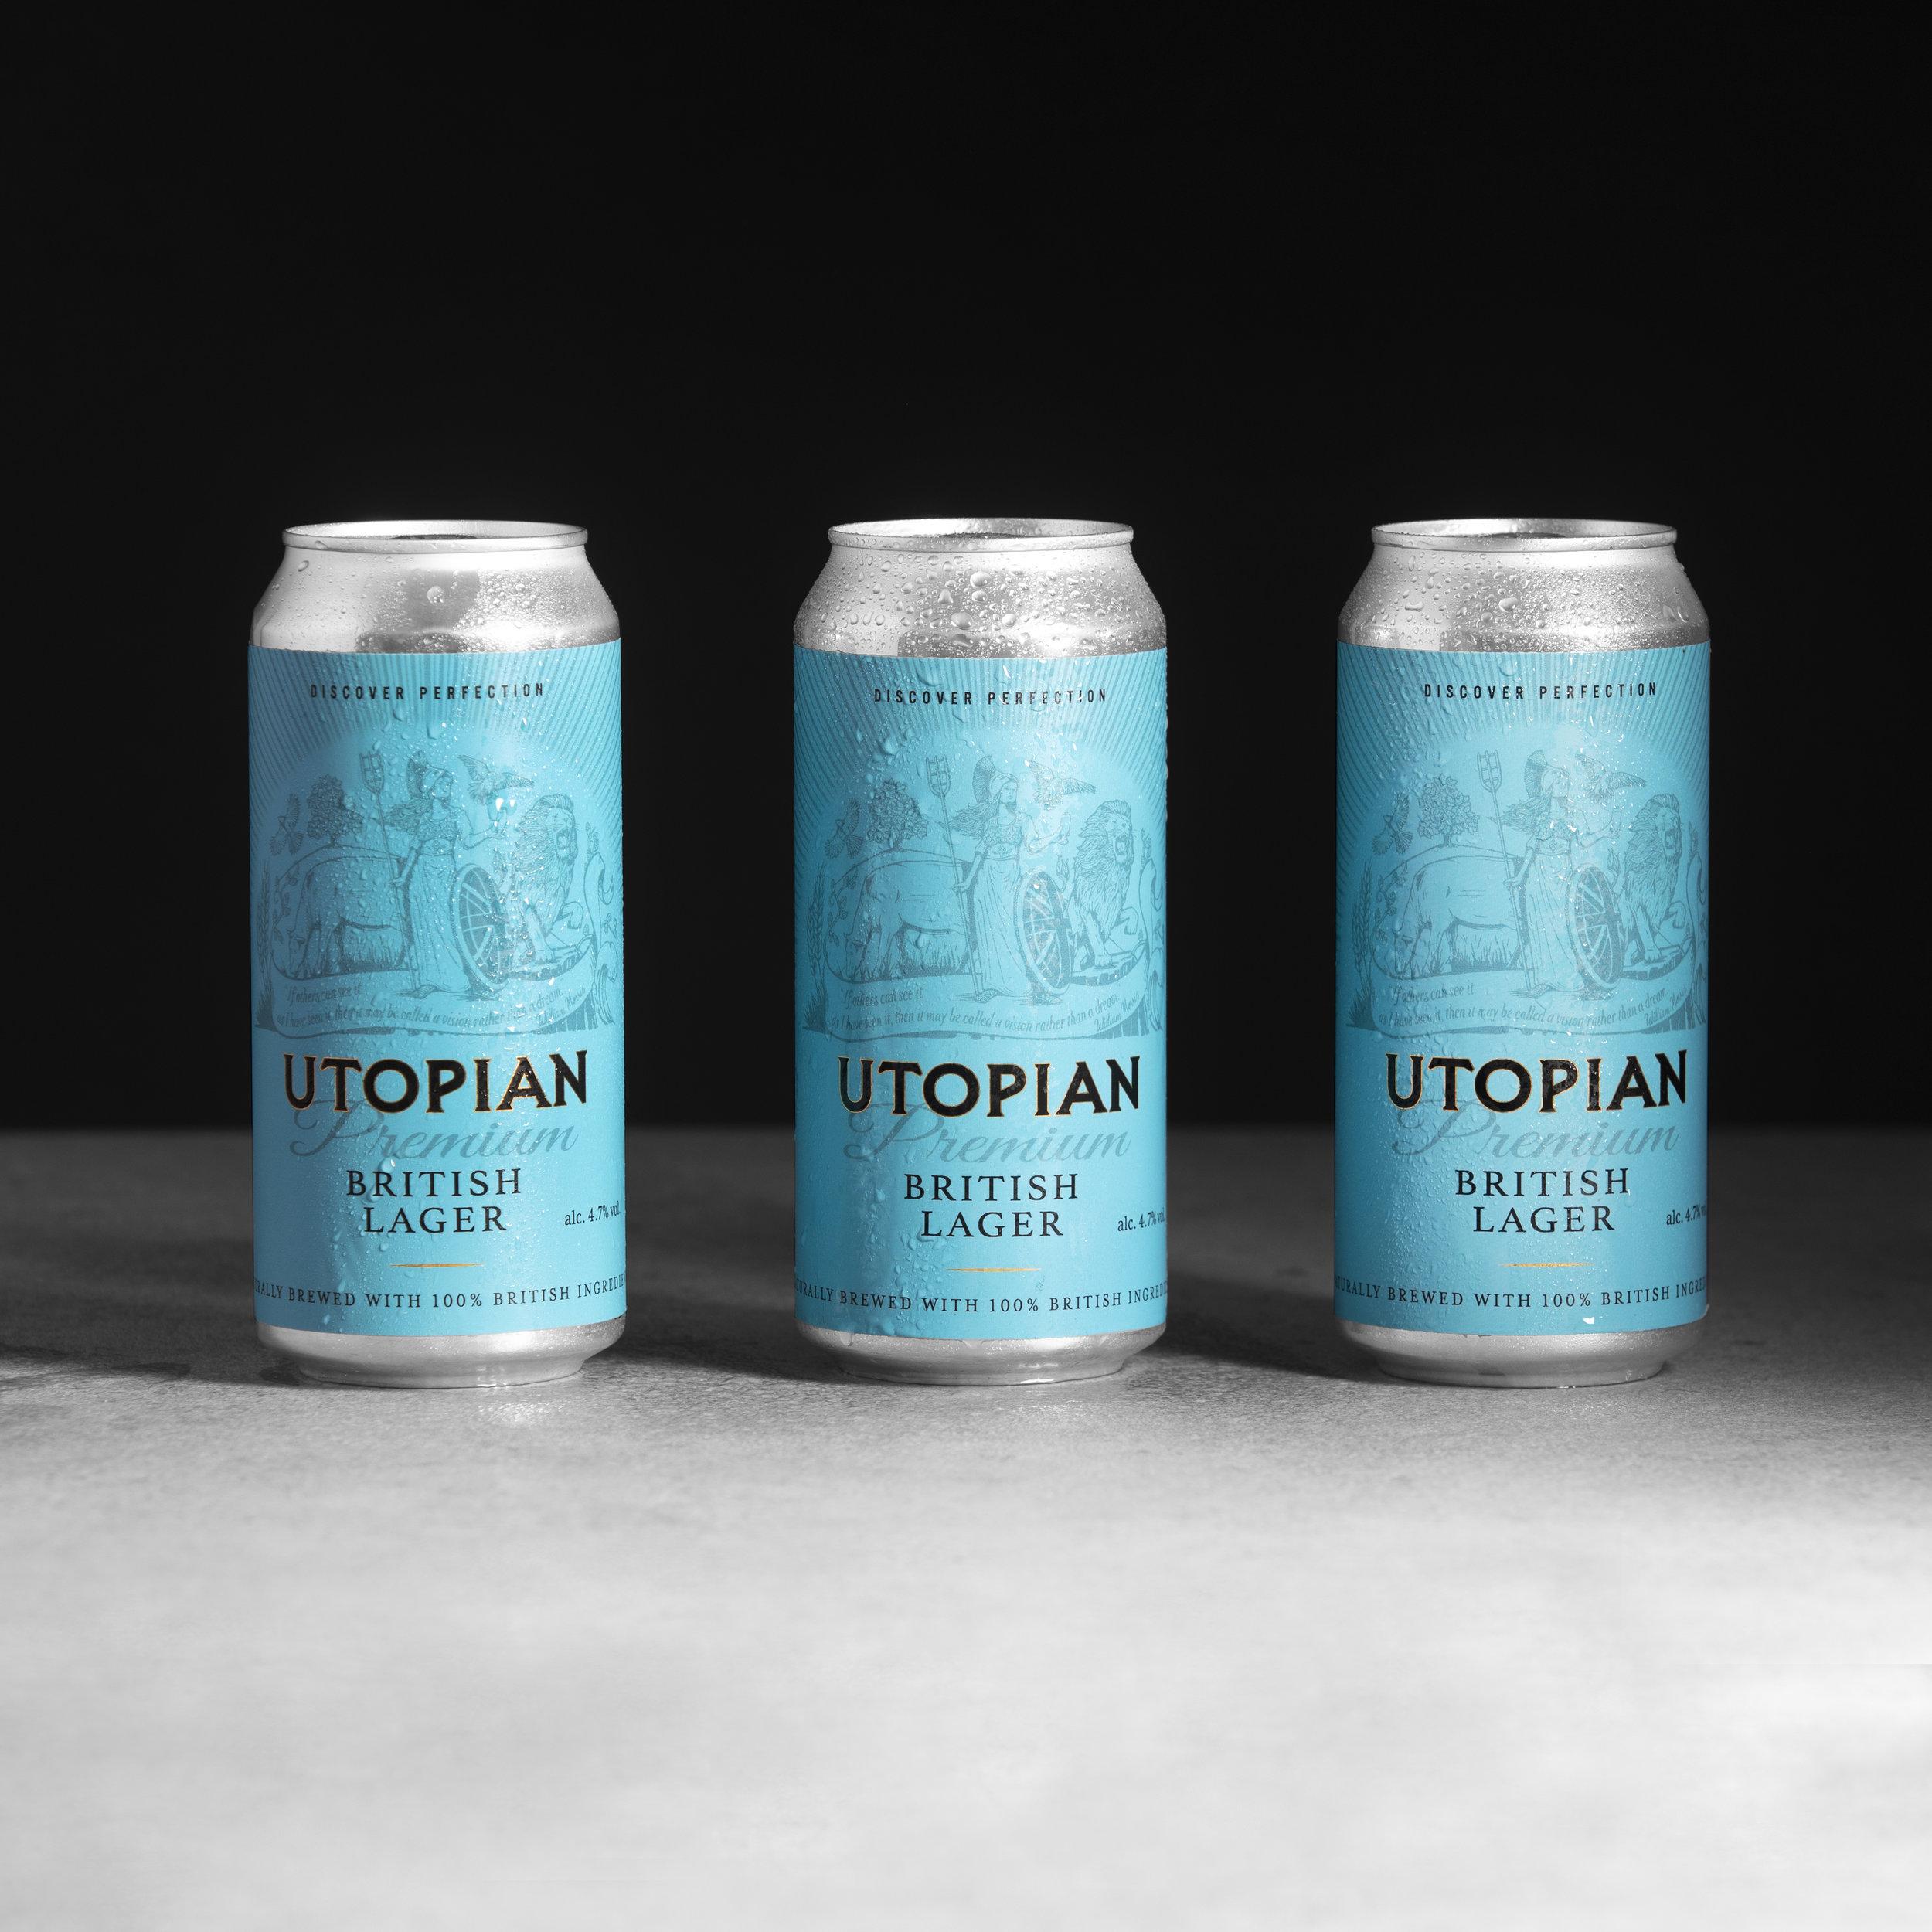 Utopian | Premium British Lager | Helles Style lager 4.7% 440ml